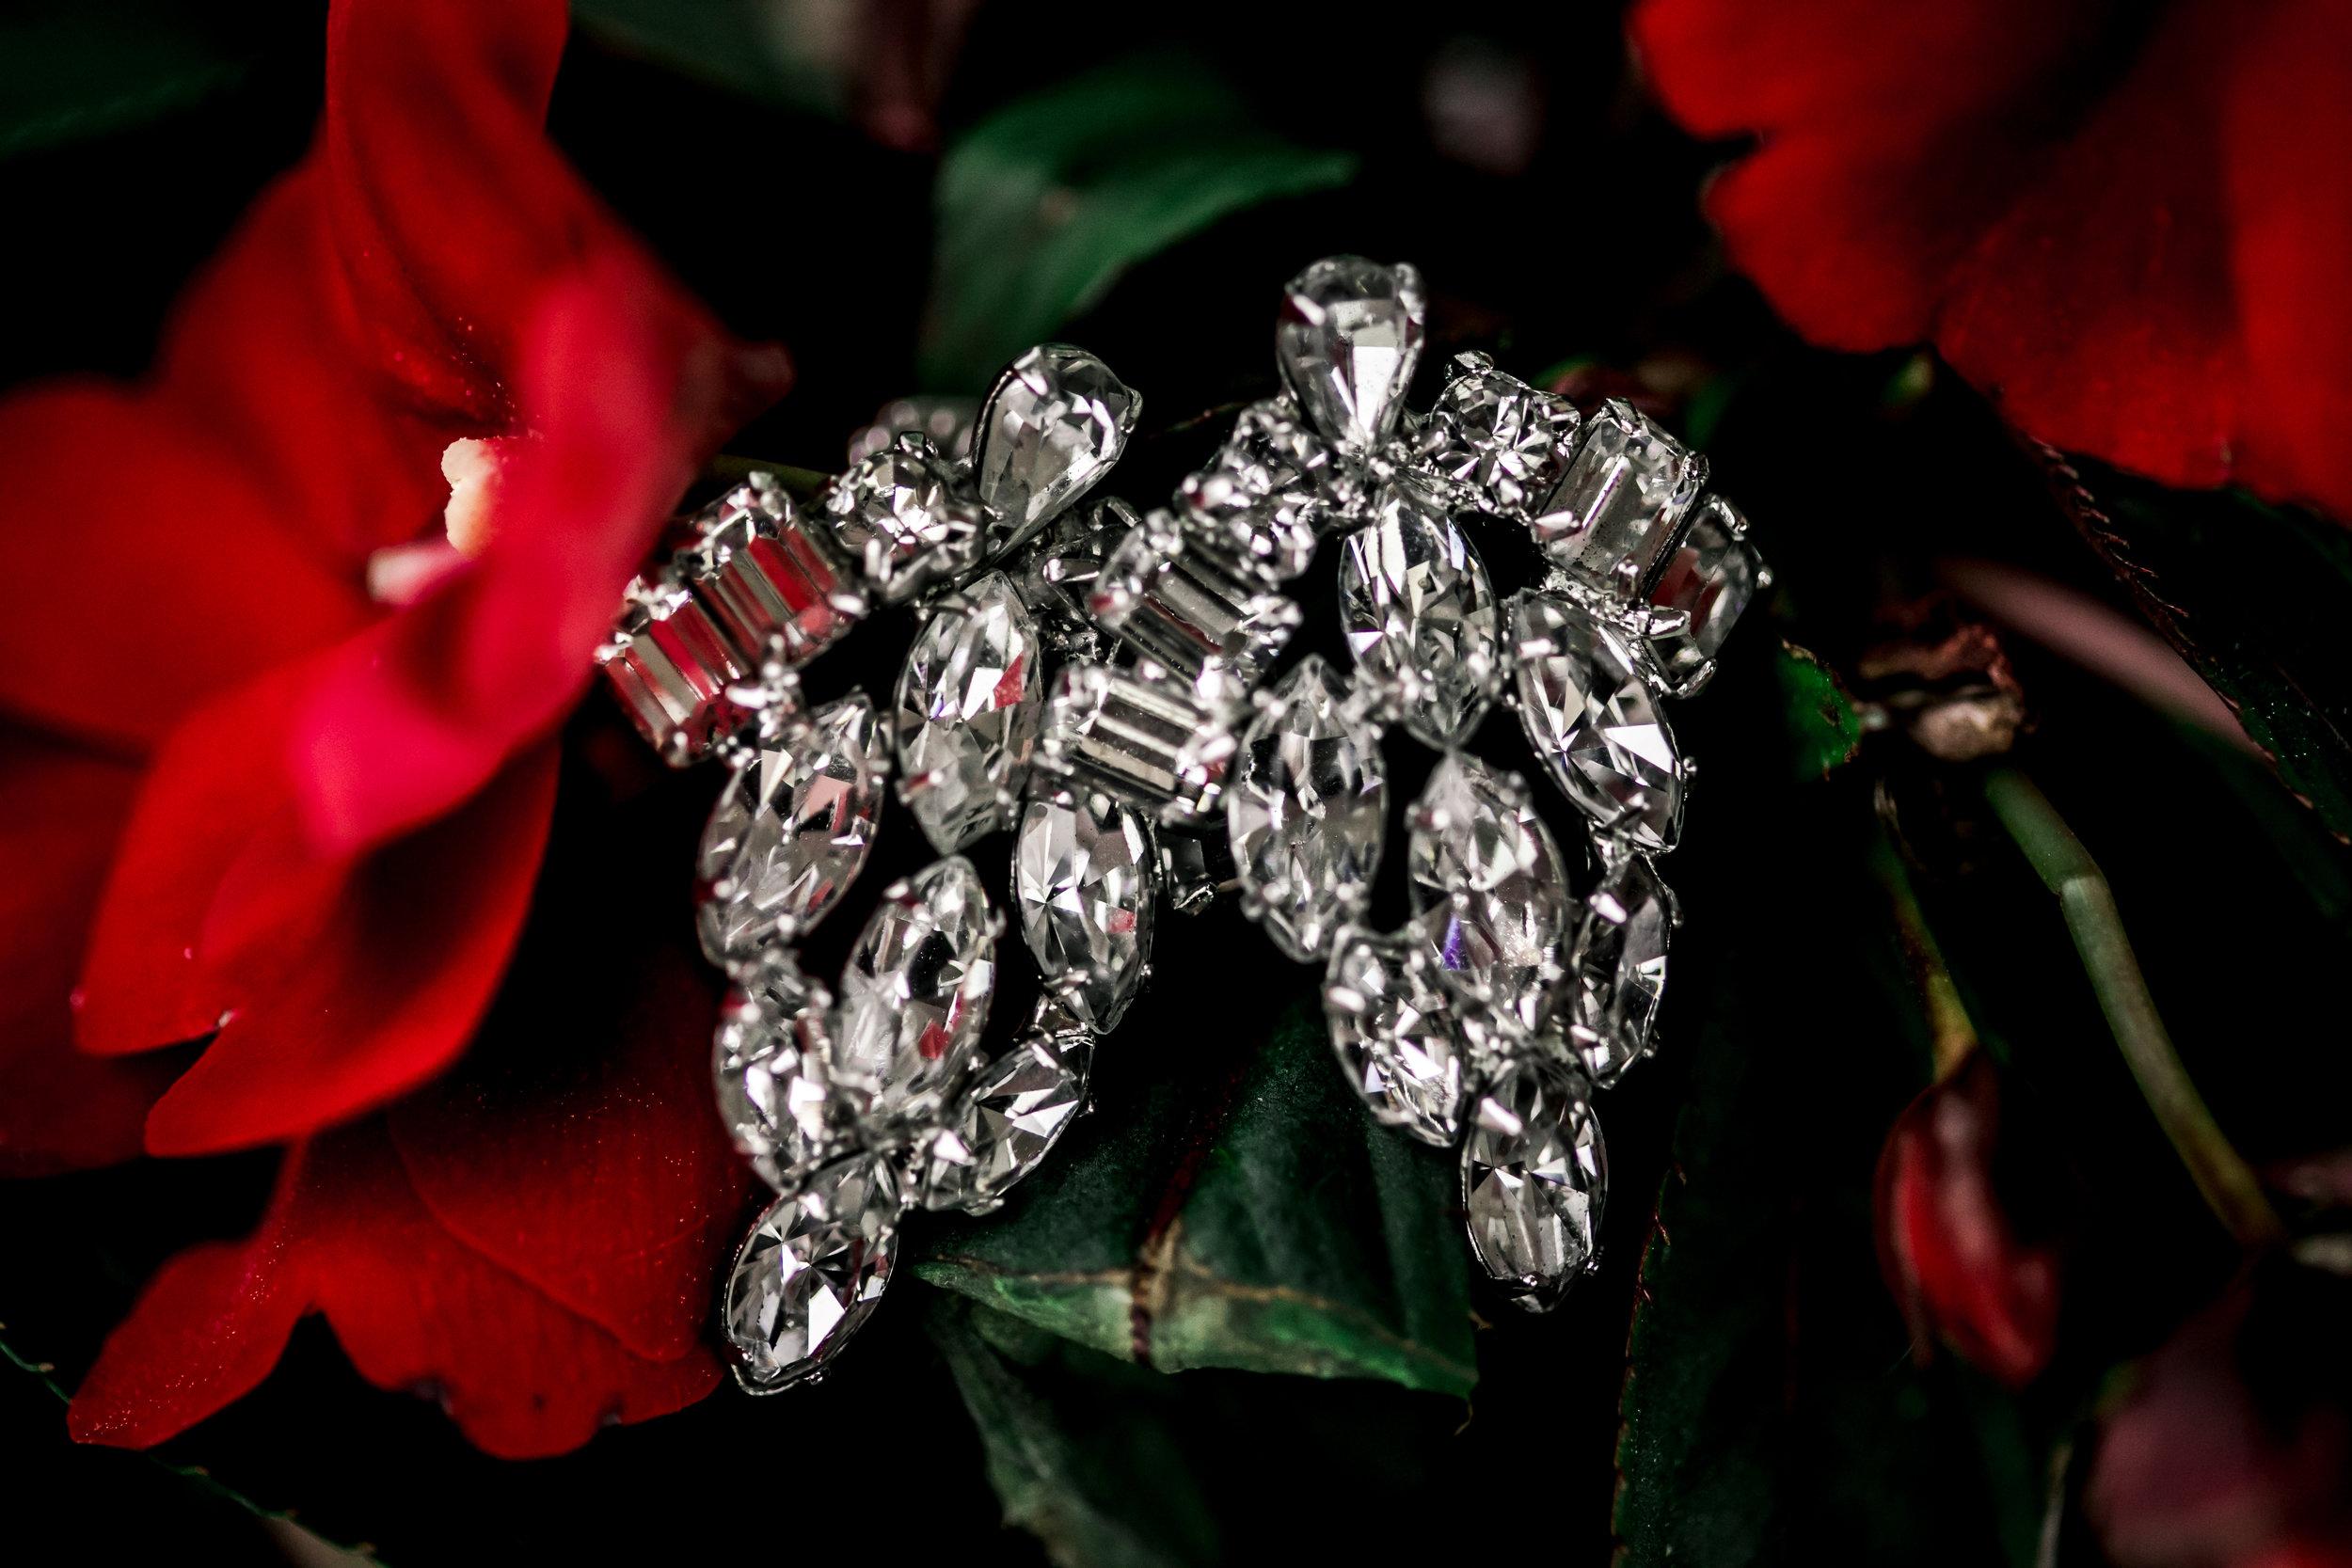 Lauren-ashley-studios-photography-details-earrings.jpg